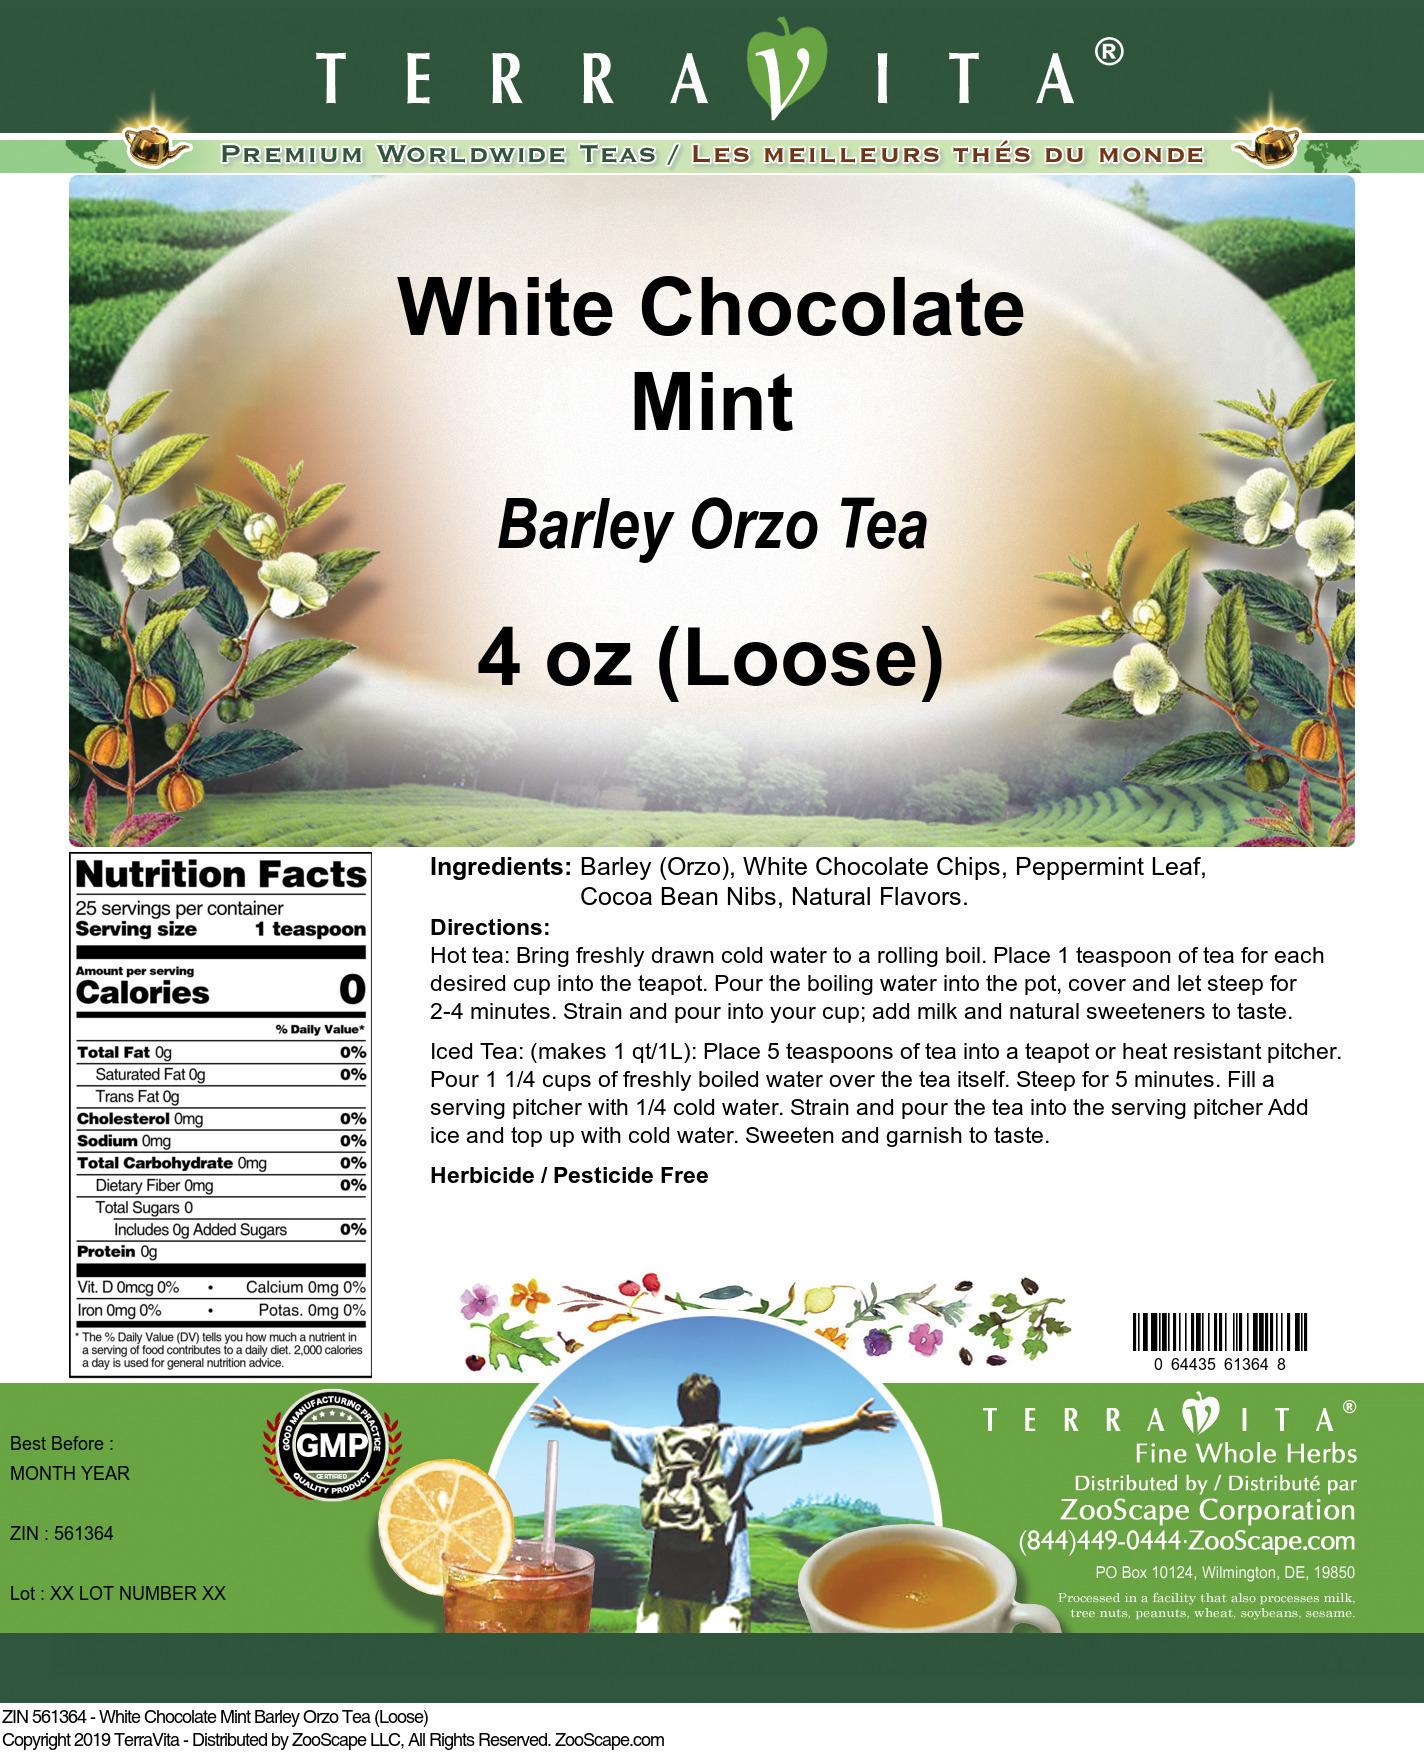 White Chocolate Mint Barley Orzo Tea (Loose)